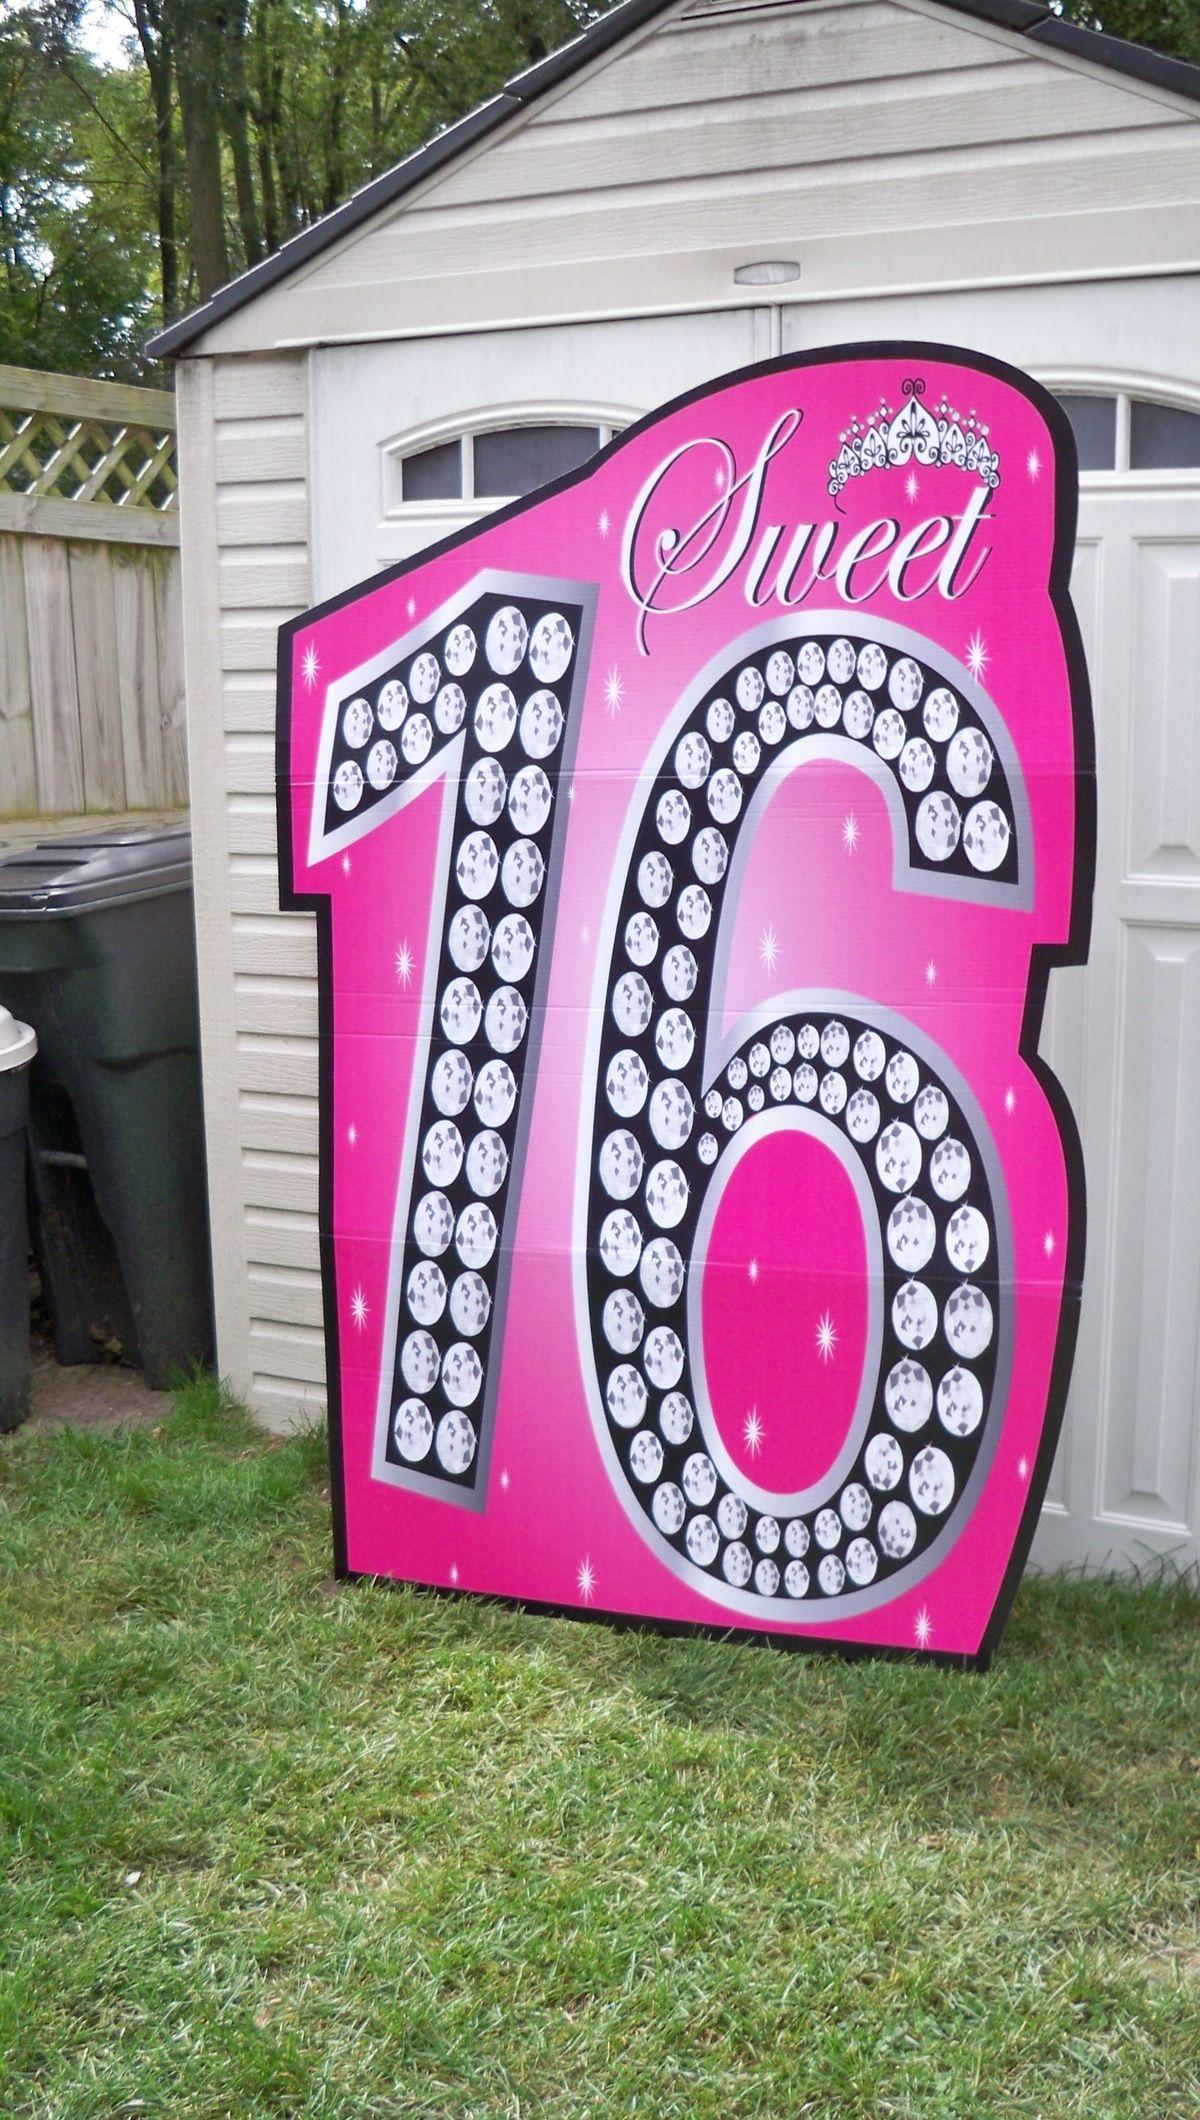 Sweet 16 background Party ideas Pinterest